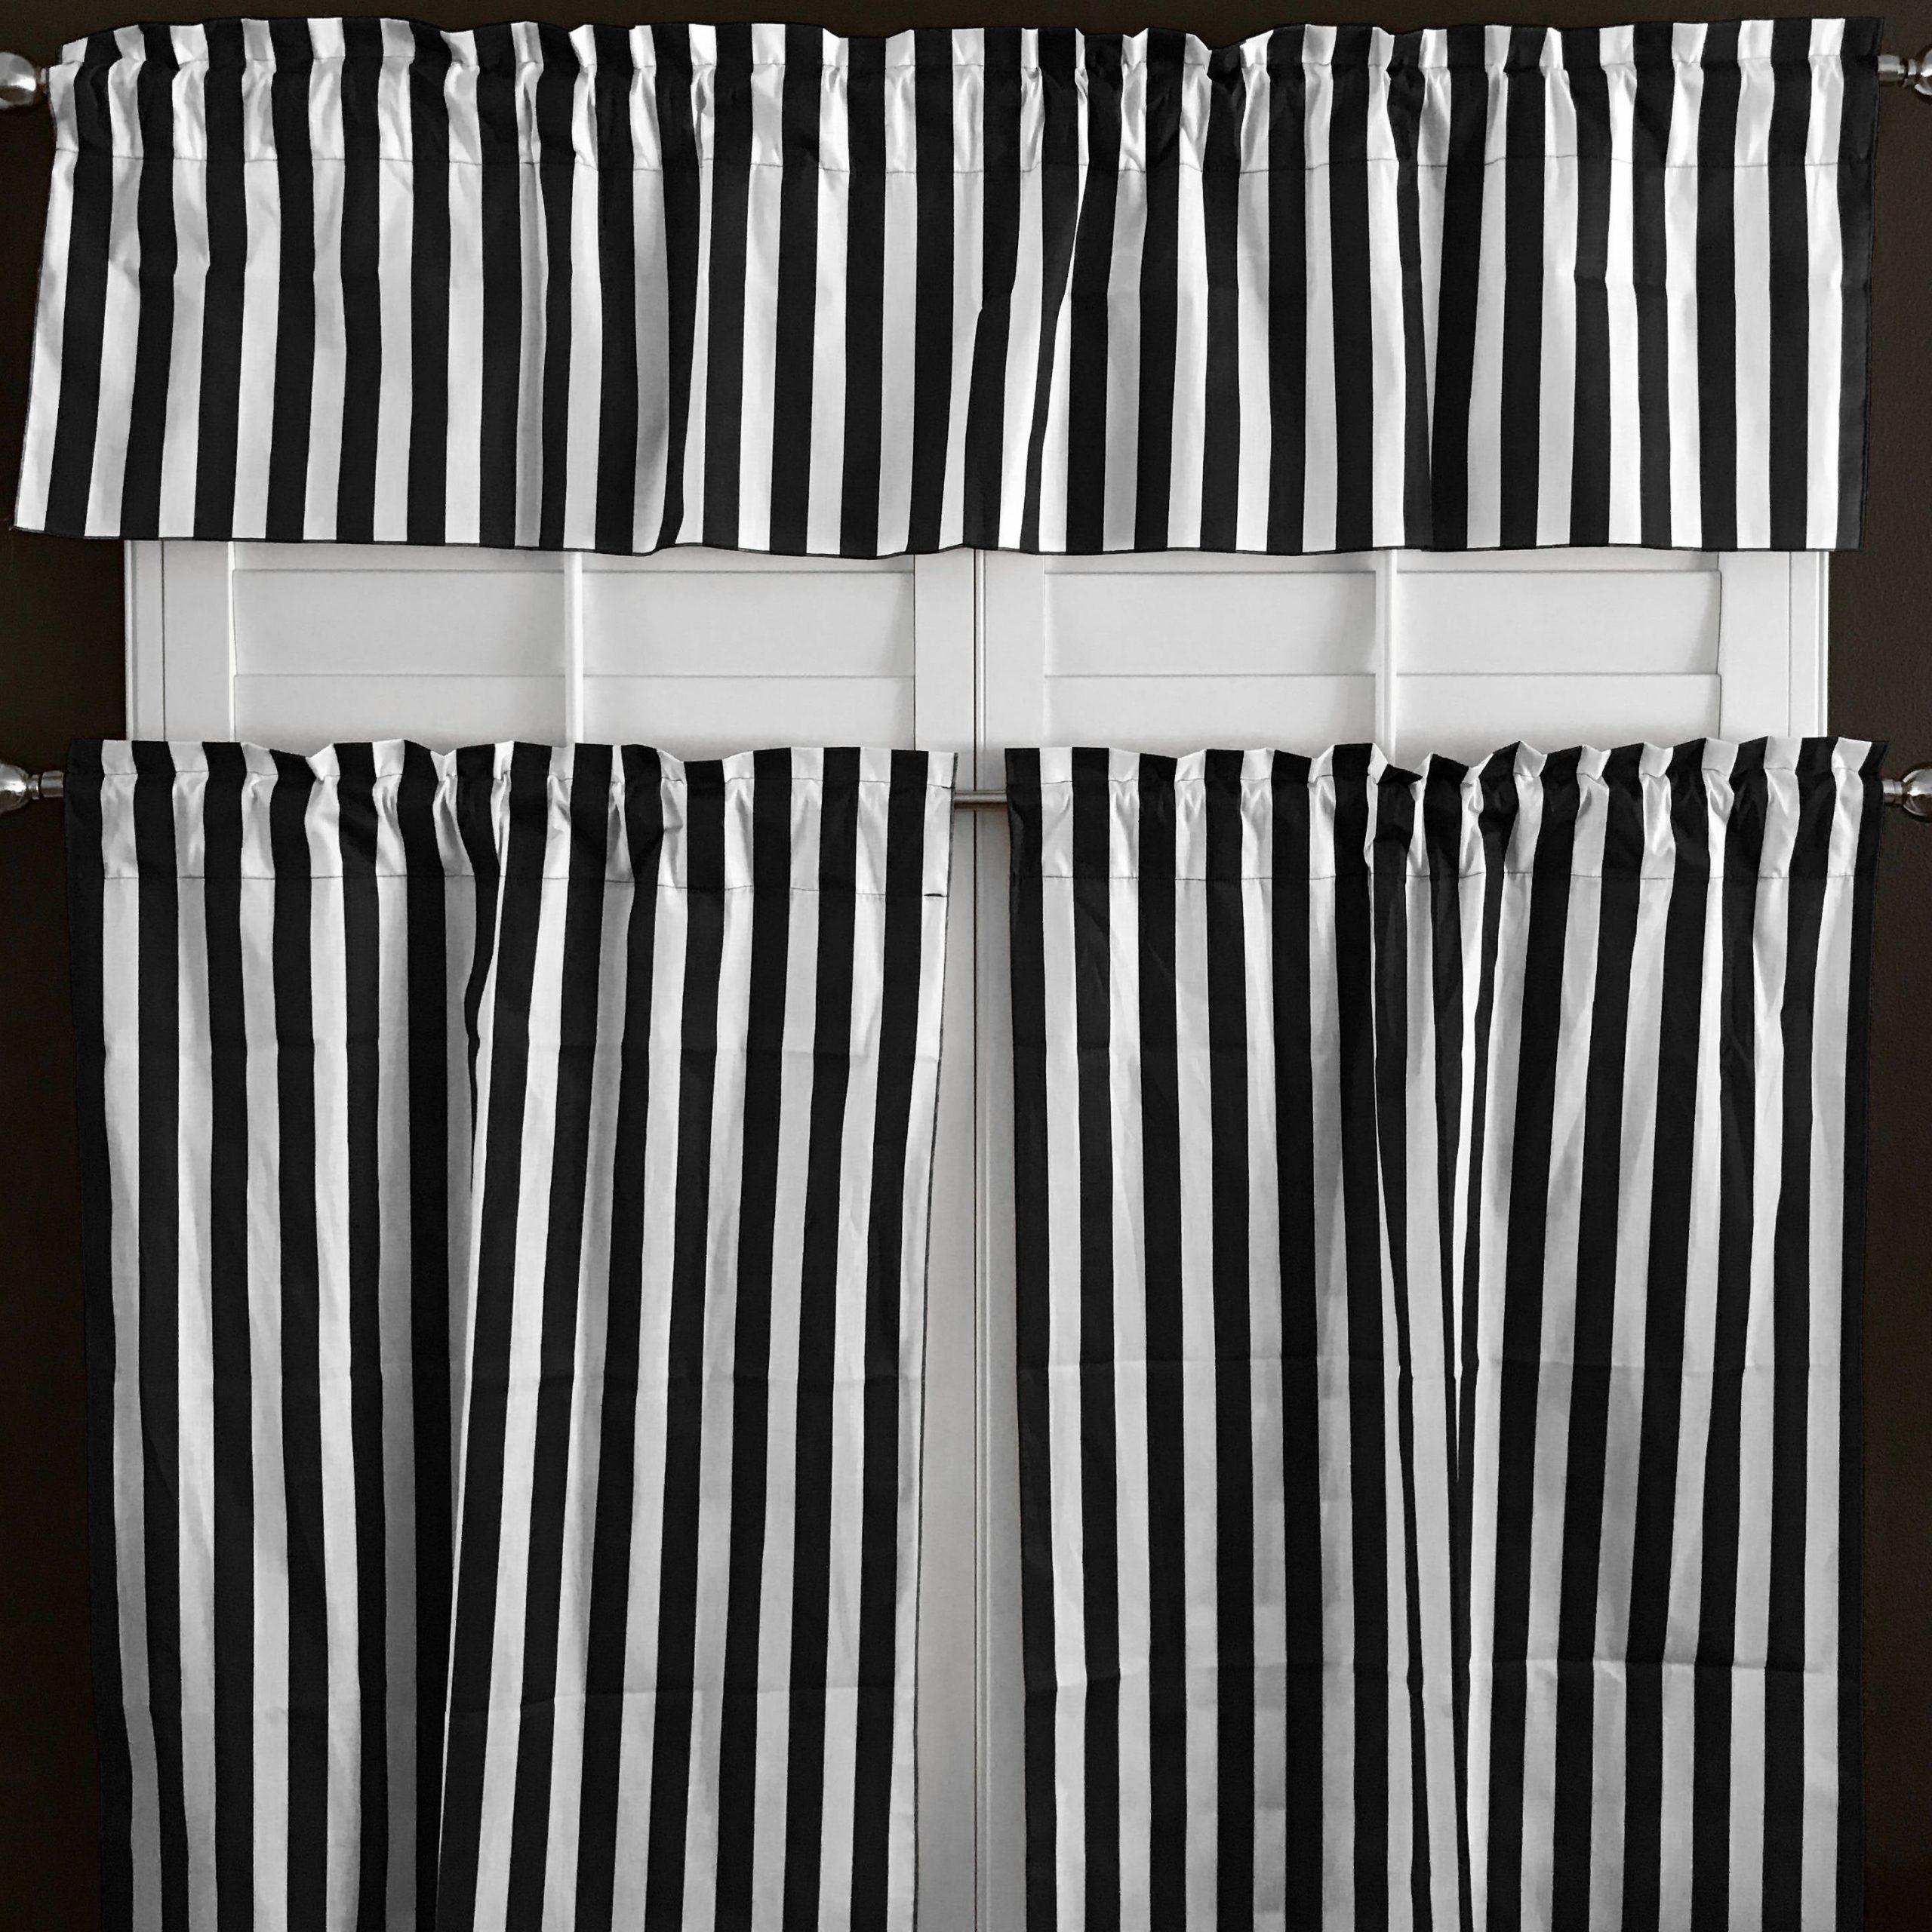 Lovemyfabric Cotton Blend Striped Print Kitchen Curtain Tier/valance Window Treatment Regarding Cotton Blend Grey Kitchen Curtain Tiers (View 13 of 20)